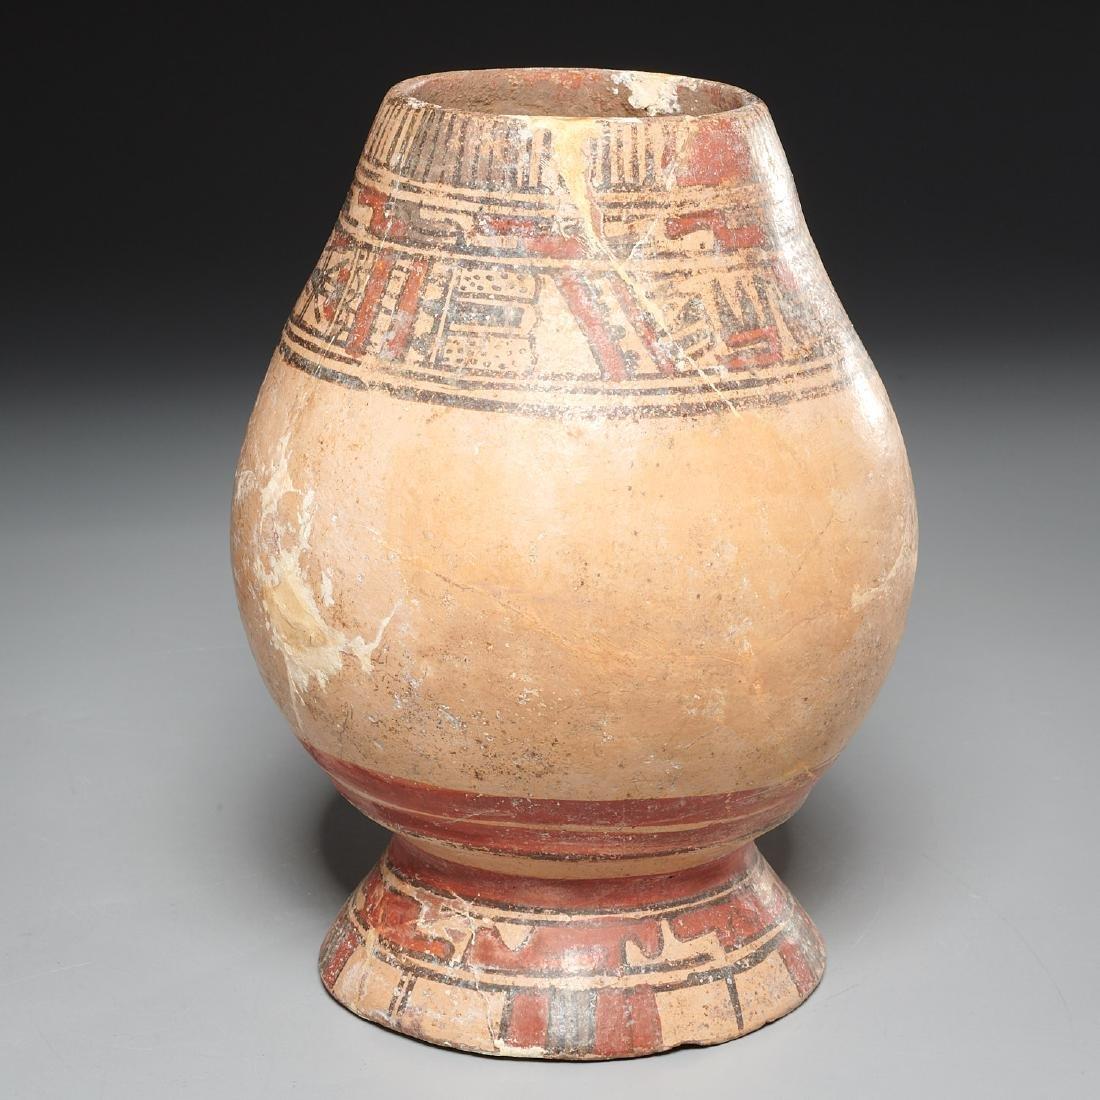 Group (4) Pre-Columbian terracotta vessels - 3